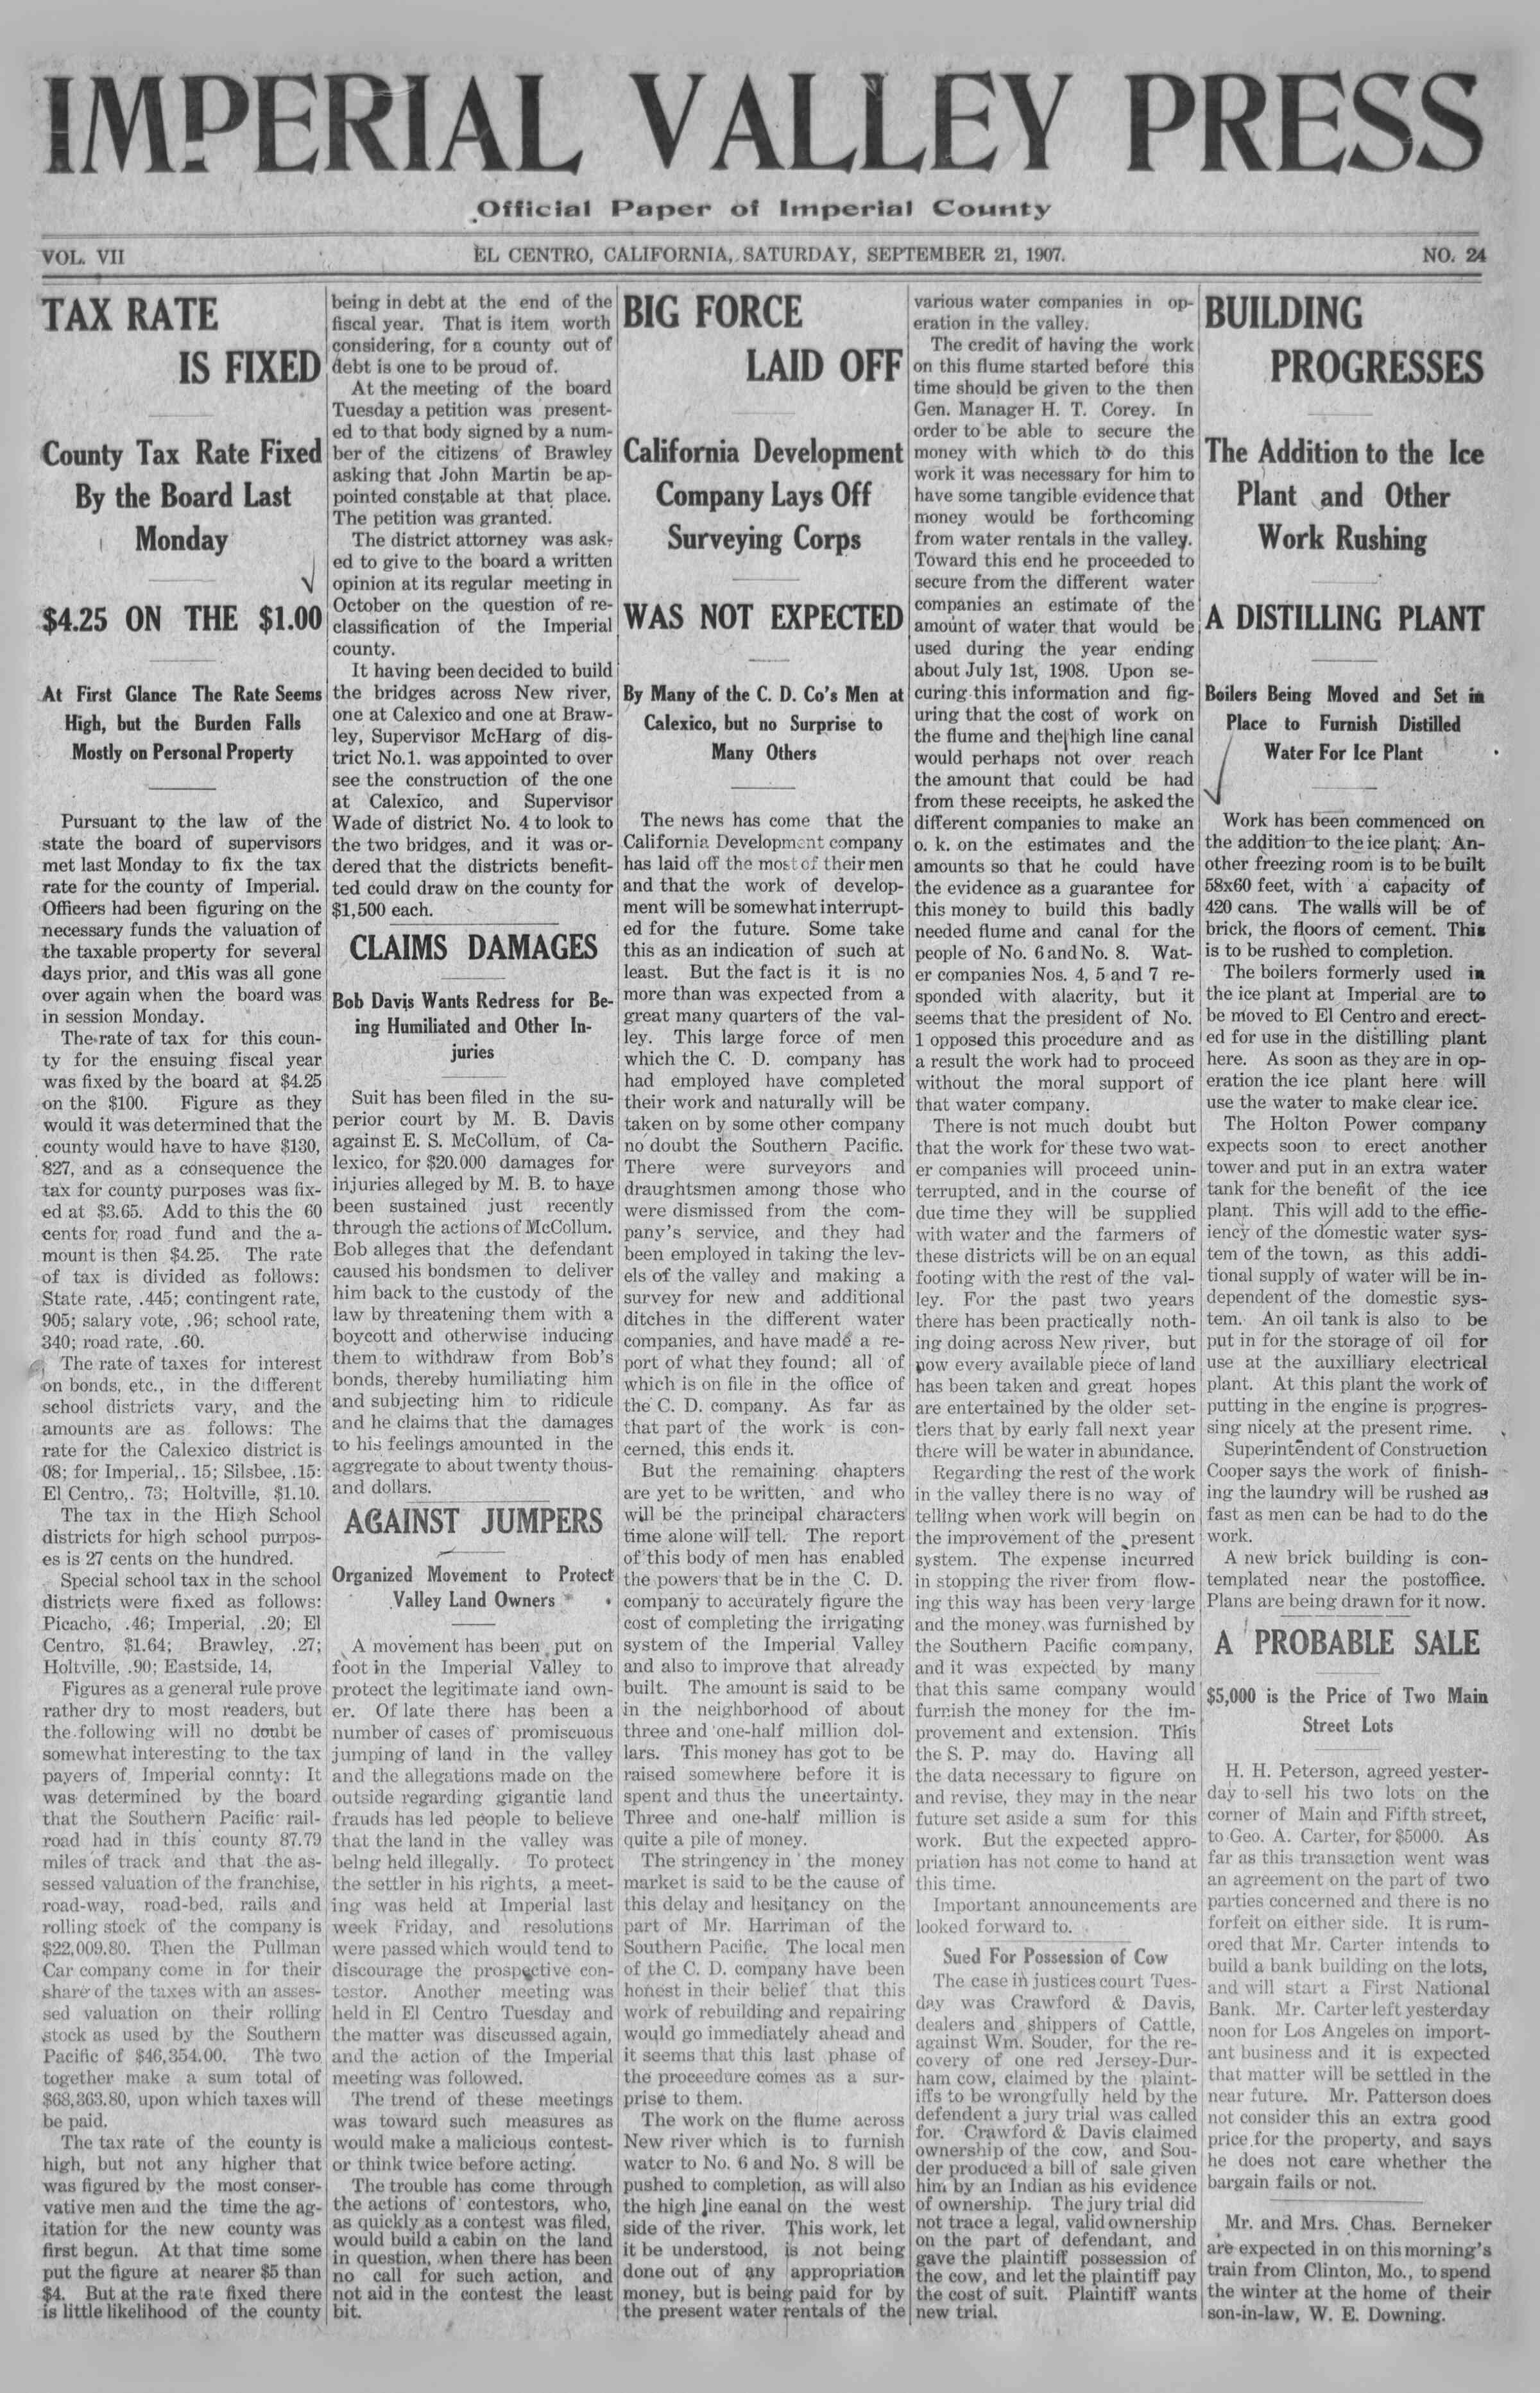 21 Eylül 1907 Tarihli Imperial Valley Press Dergisi Sayfa 1